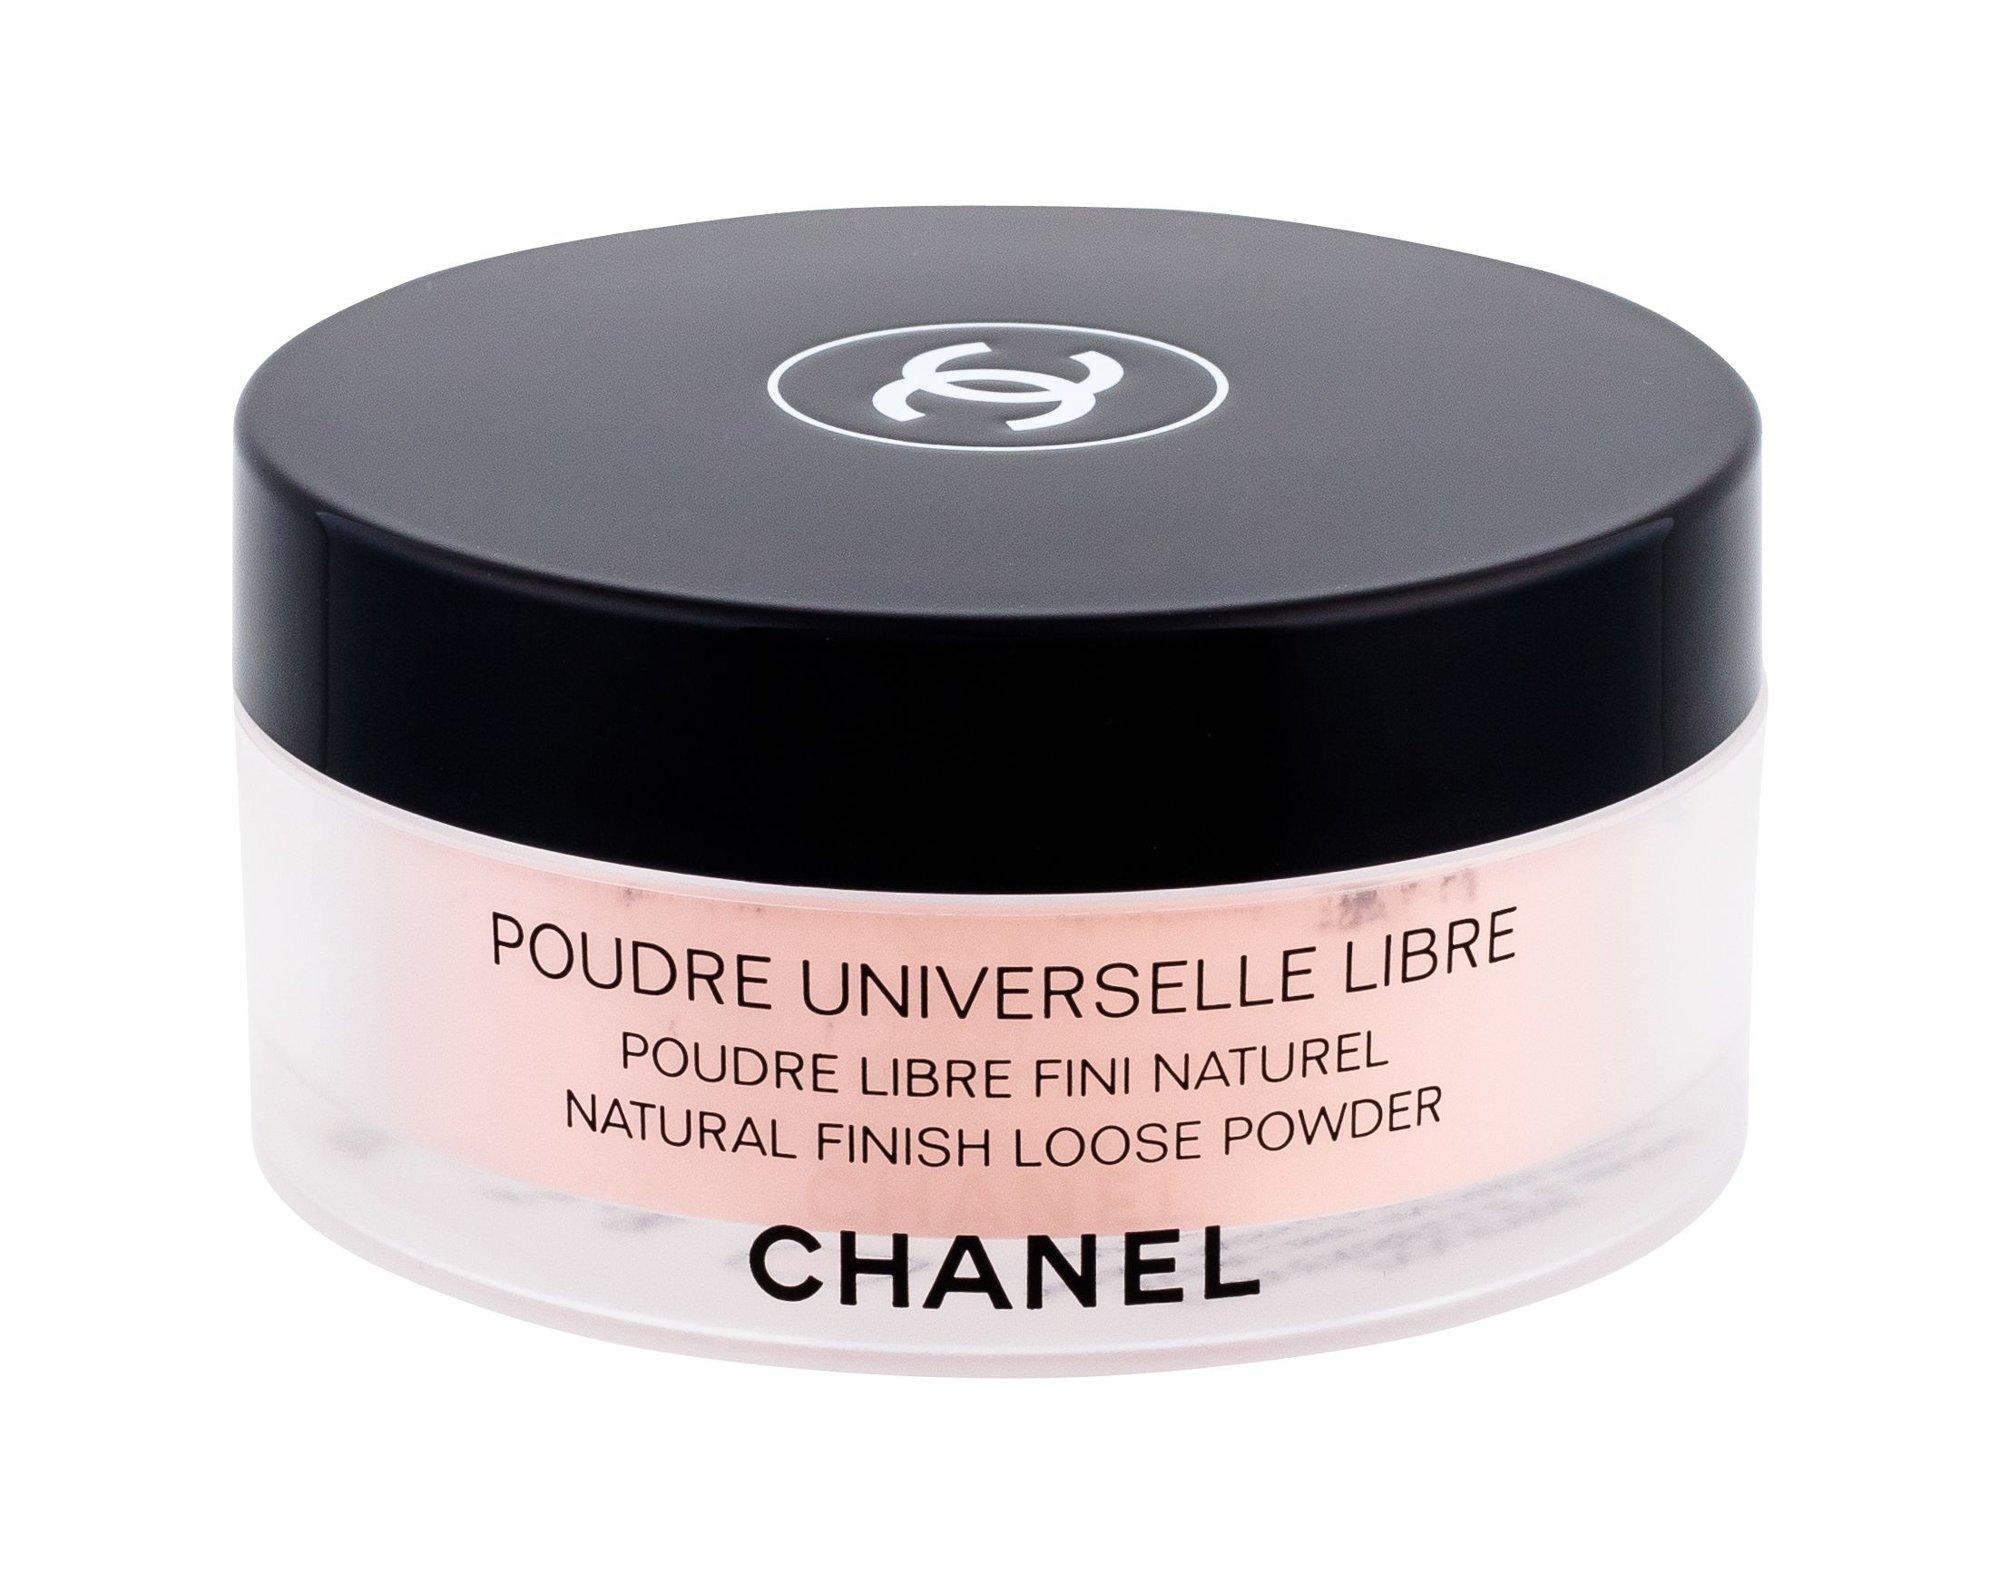 Chanel Poudre Universelle Libre Powder 30ml 22 Rose Clair